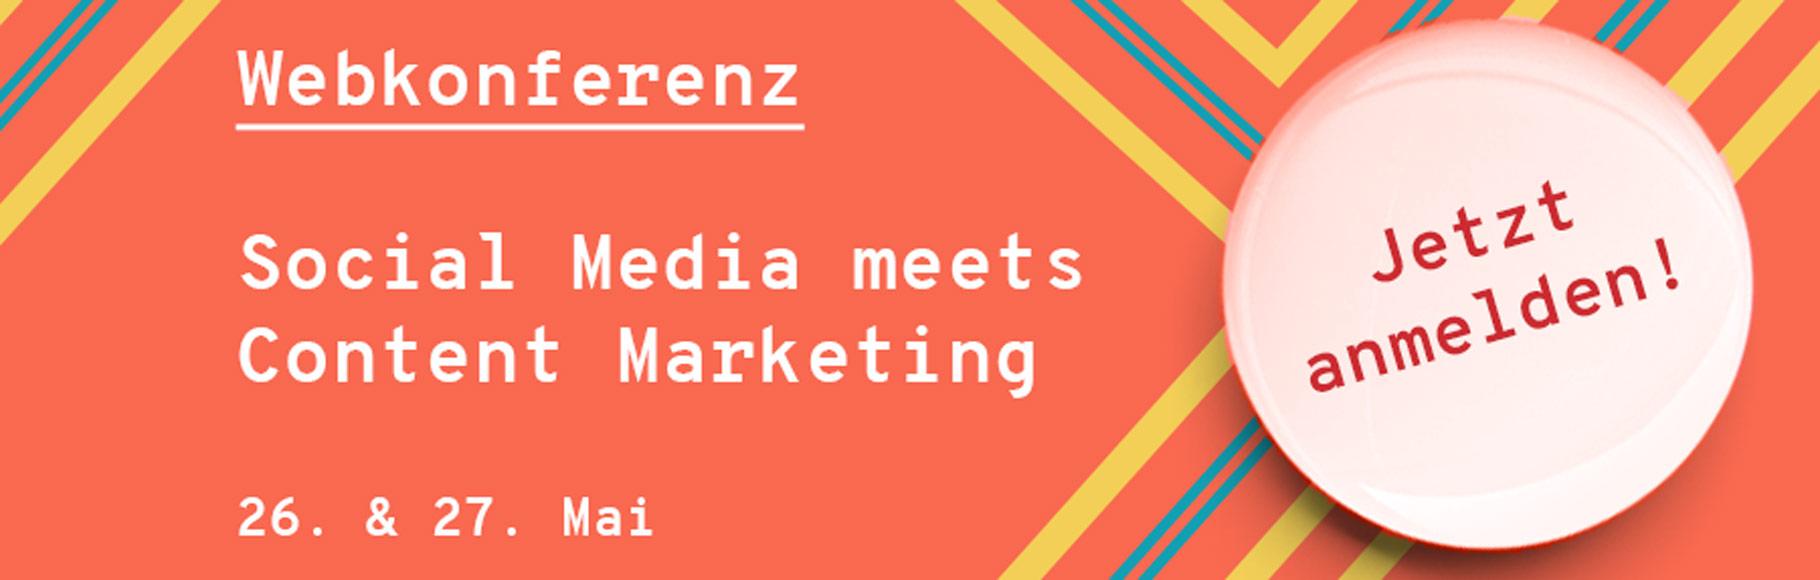 web-konferenz social media